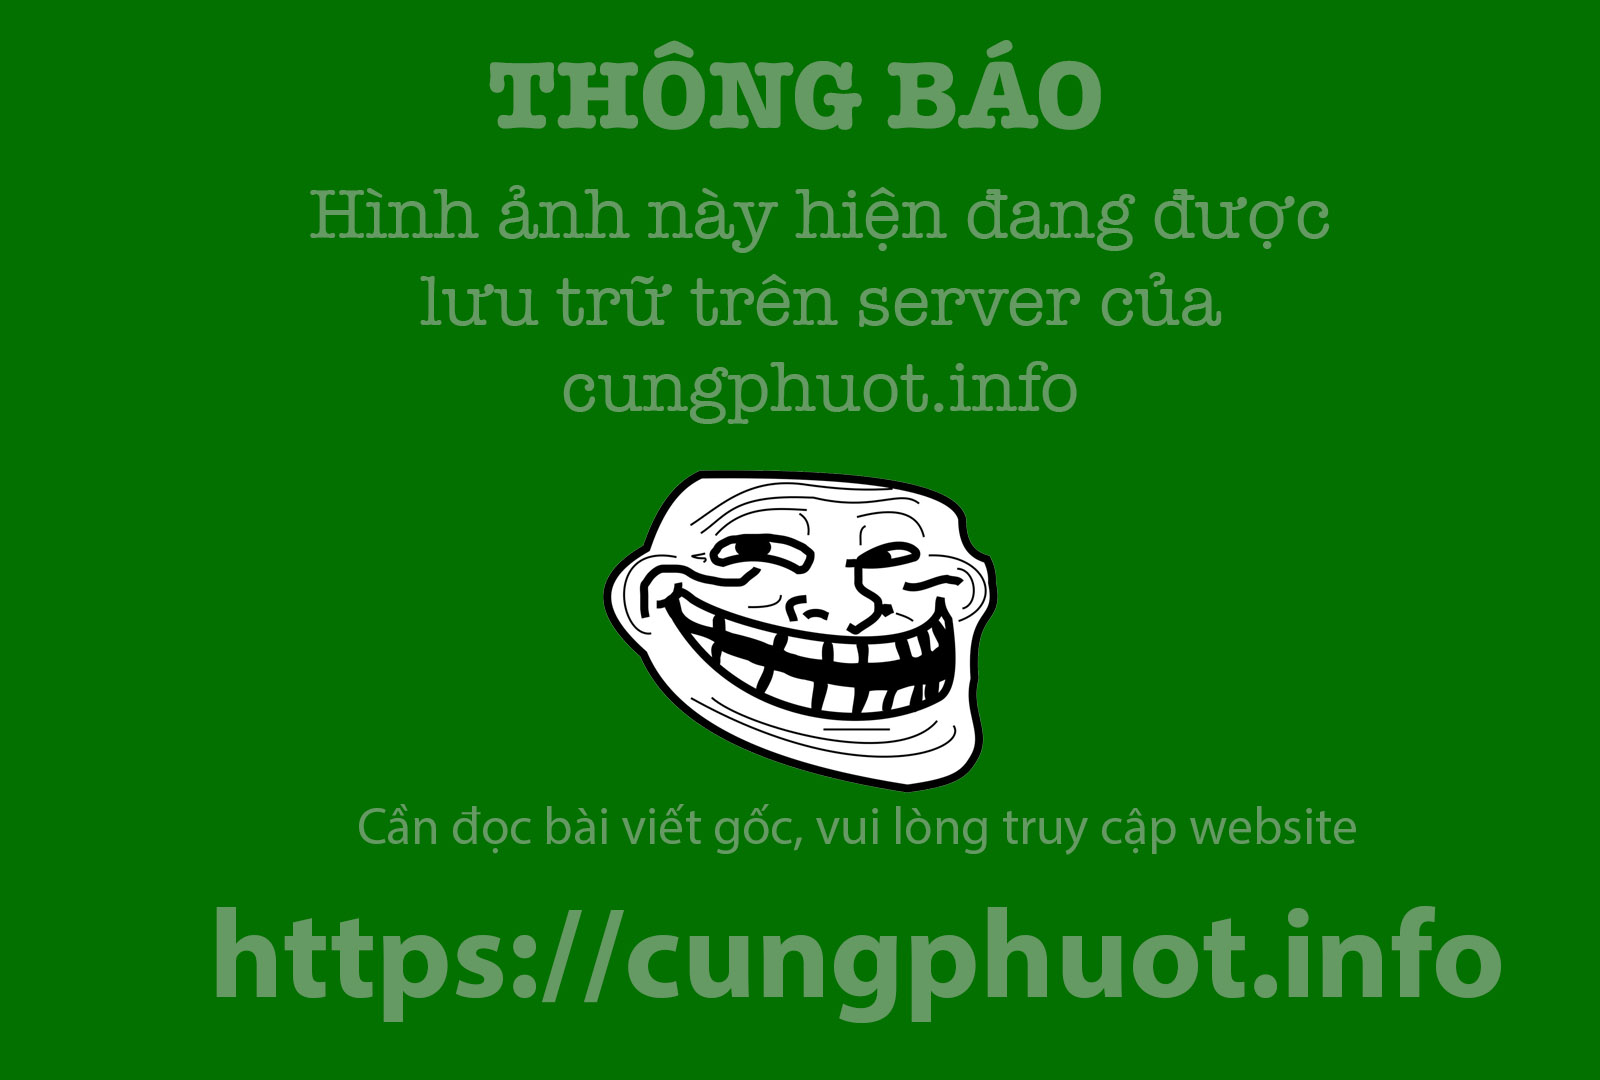 Co do Lam Kinh nhin tu tren cao hinh anh 11